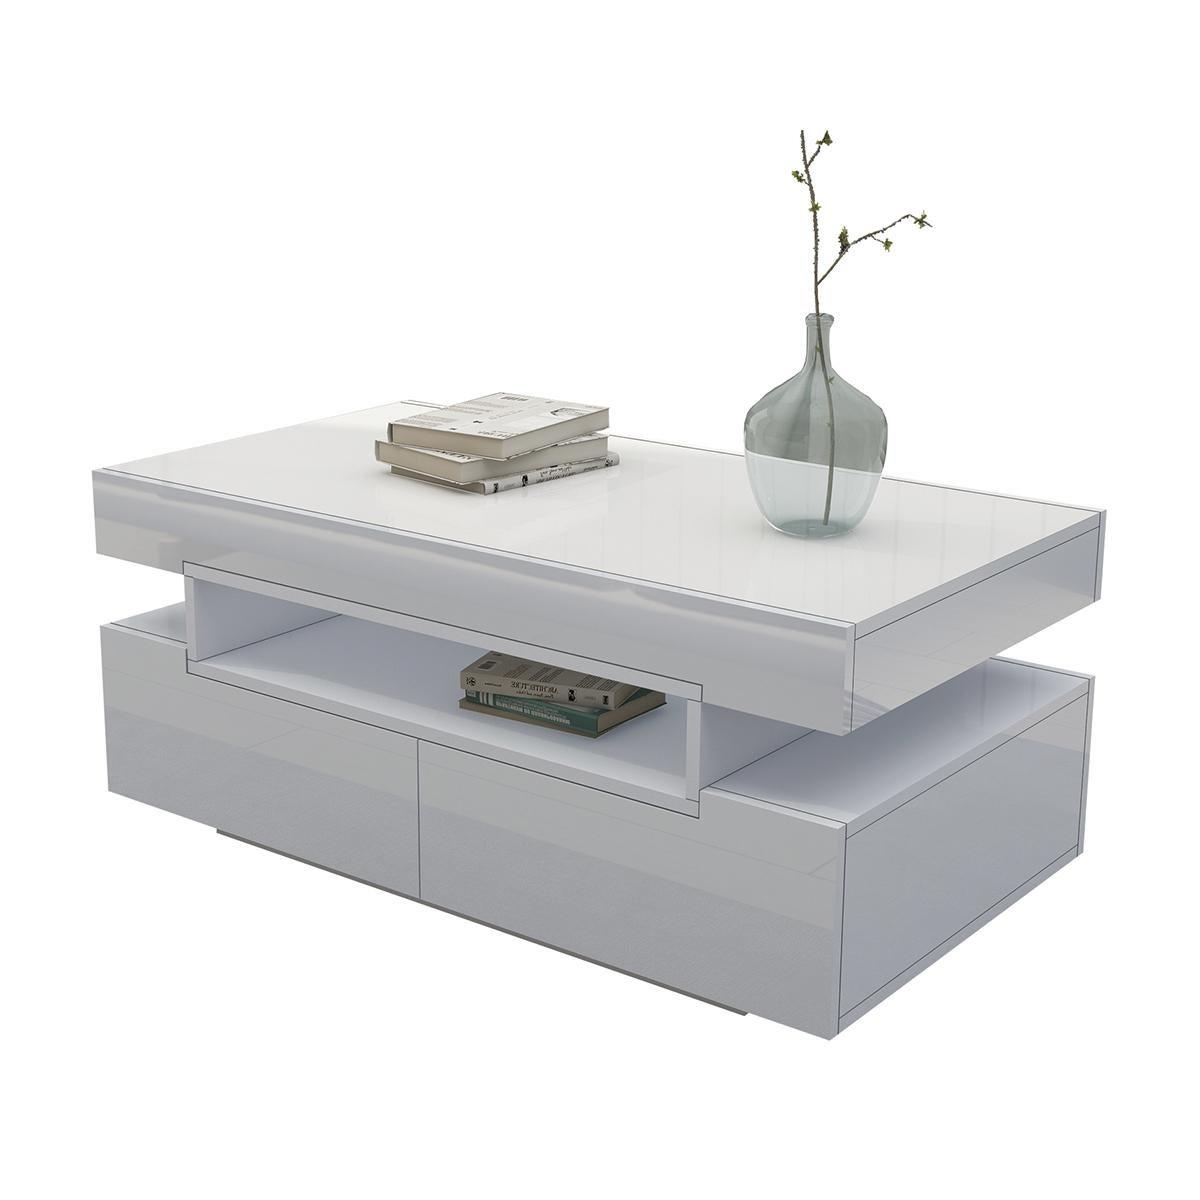 modern white coffee table 4 drawer storage shelf high gloss wood living room furniture other home decor